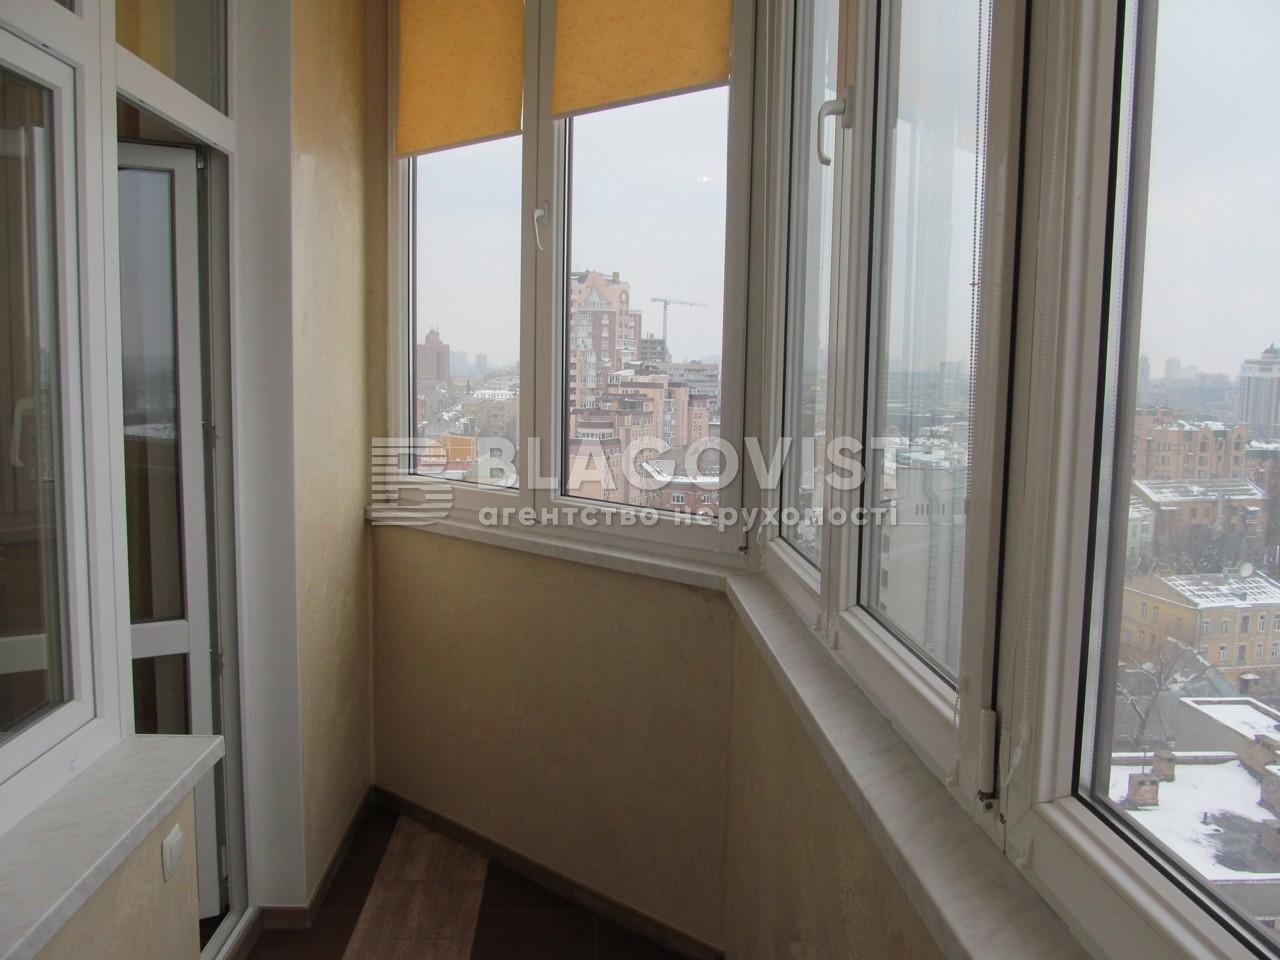 Квартира C-88214, Несторовский пер., 6, Киев - Фото 25